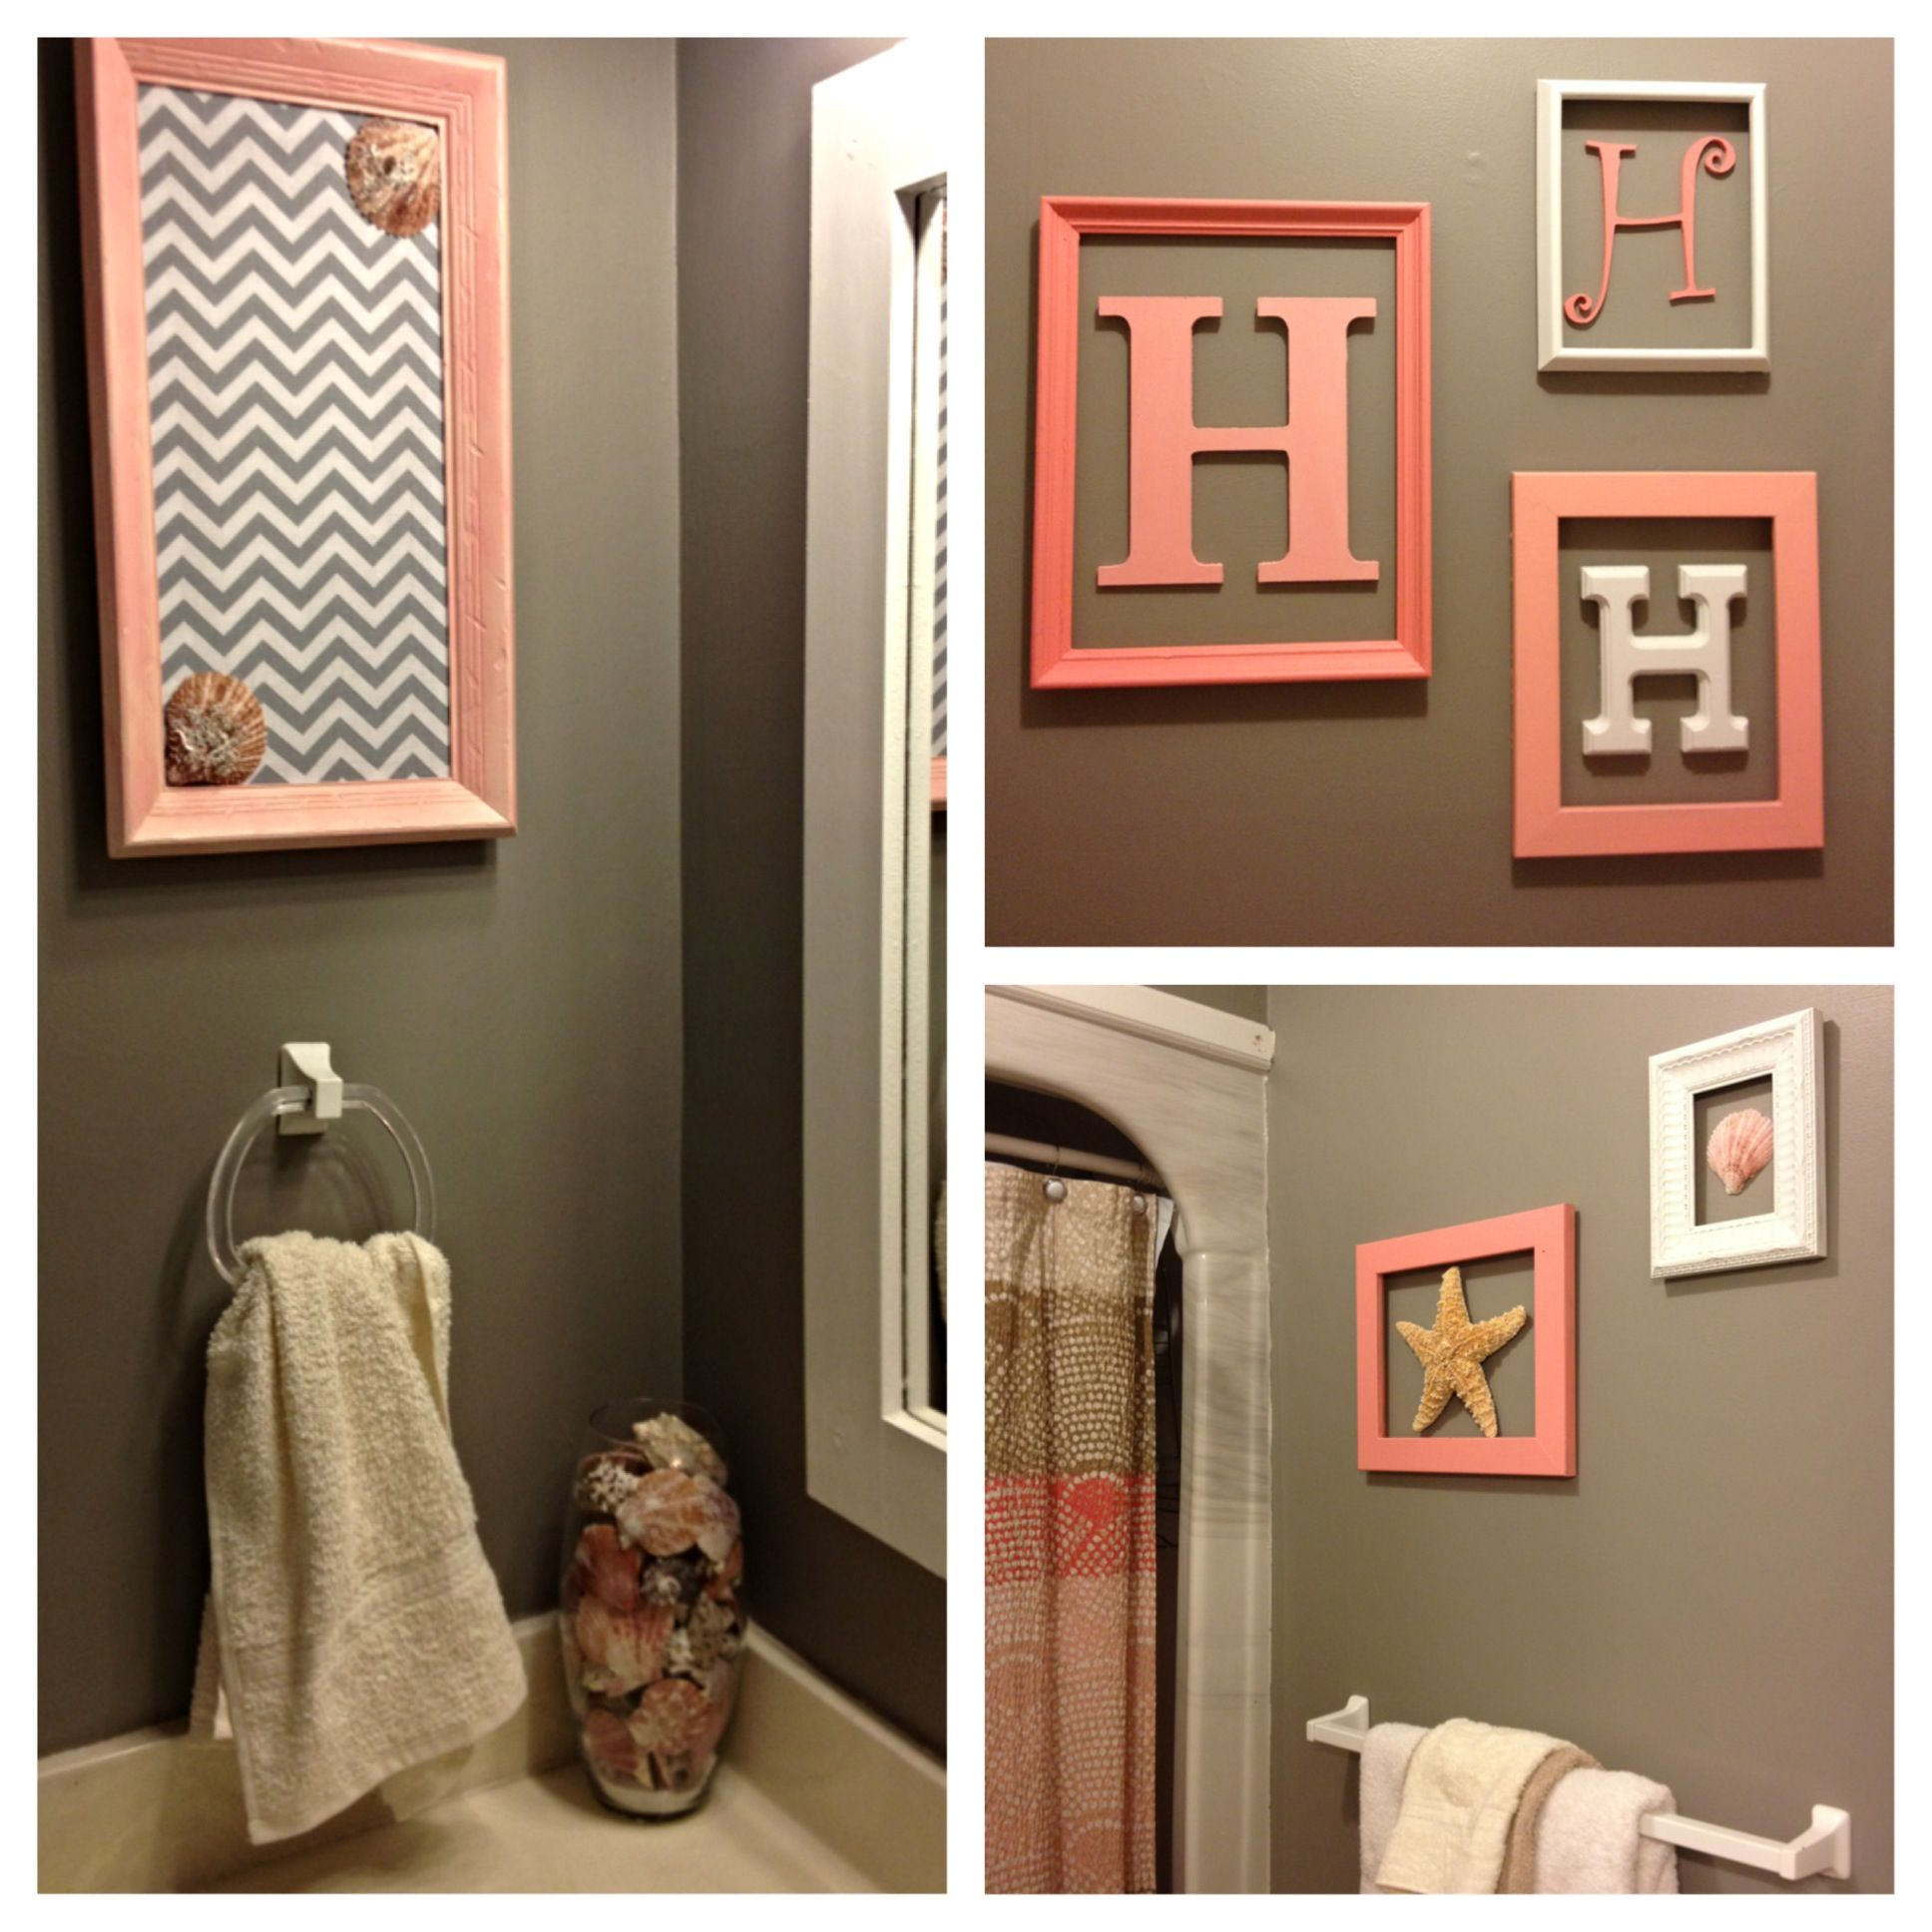 Pin By Kelly Heflin On Home Coral Bathroom Decor Pink Bathroom